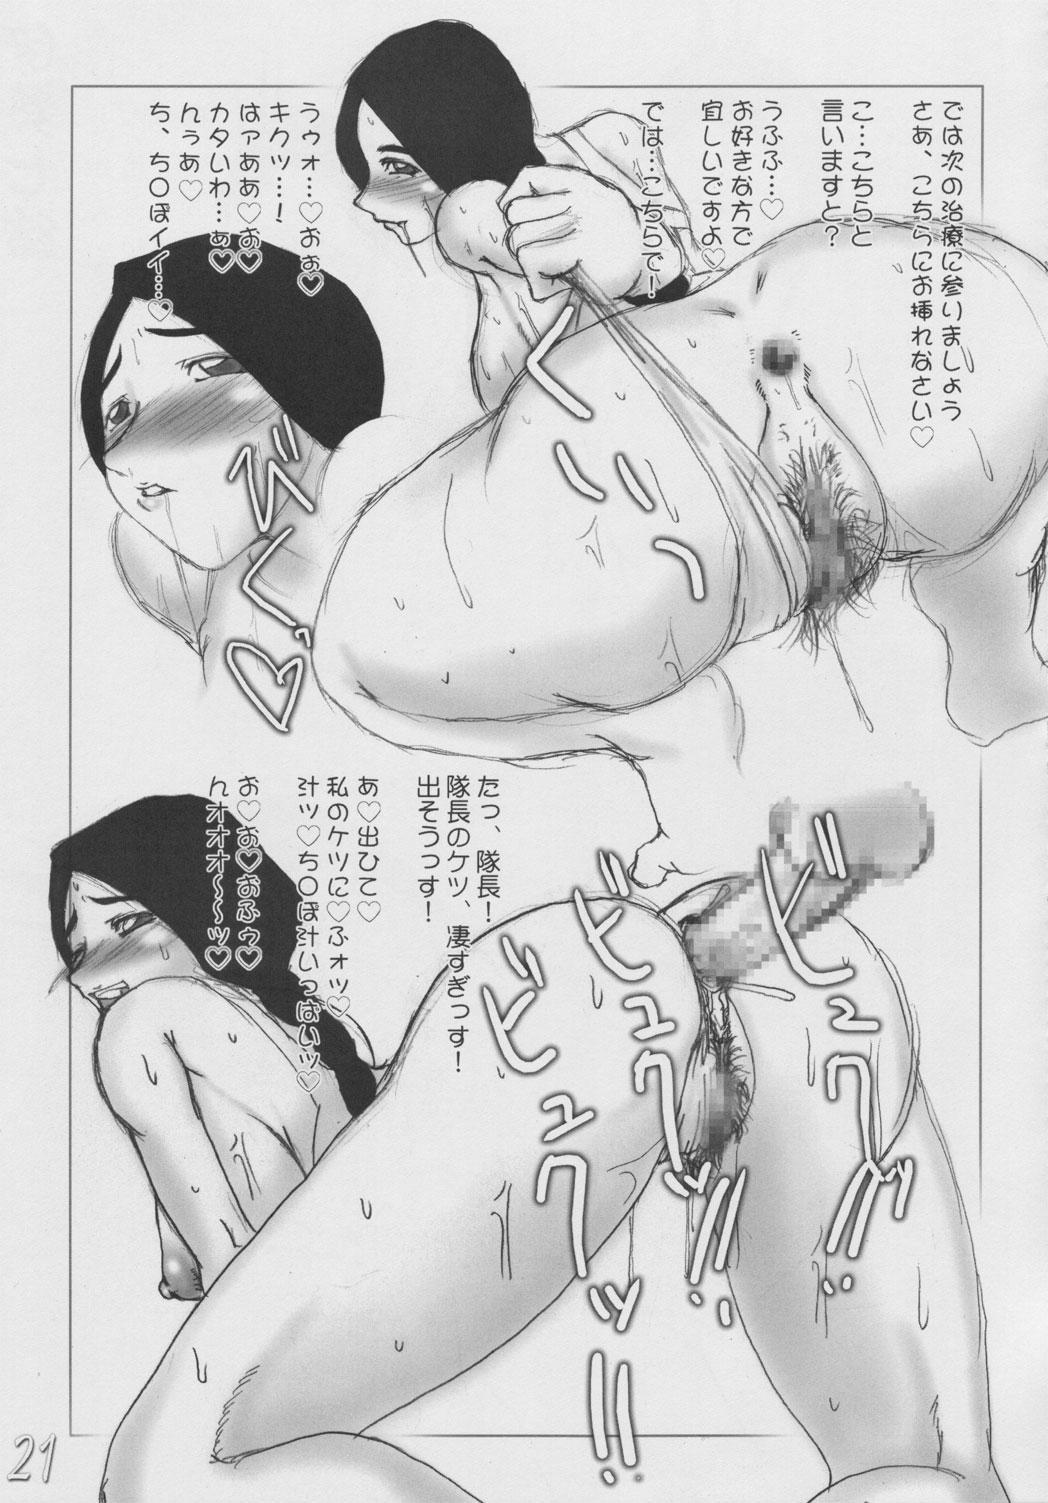 (ComiComi8) [HIGHWAY-SENMU (Maban, Saikoubi)] H-Sen vol. 8 -Erotical noma noma iei!!- (BLEACH) 19